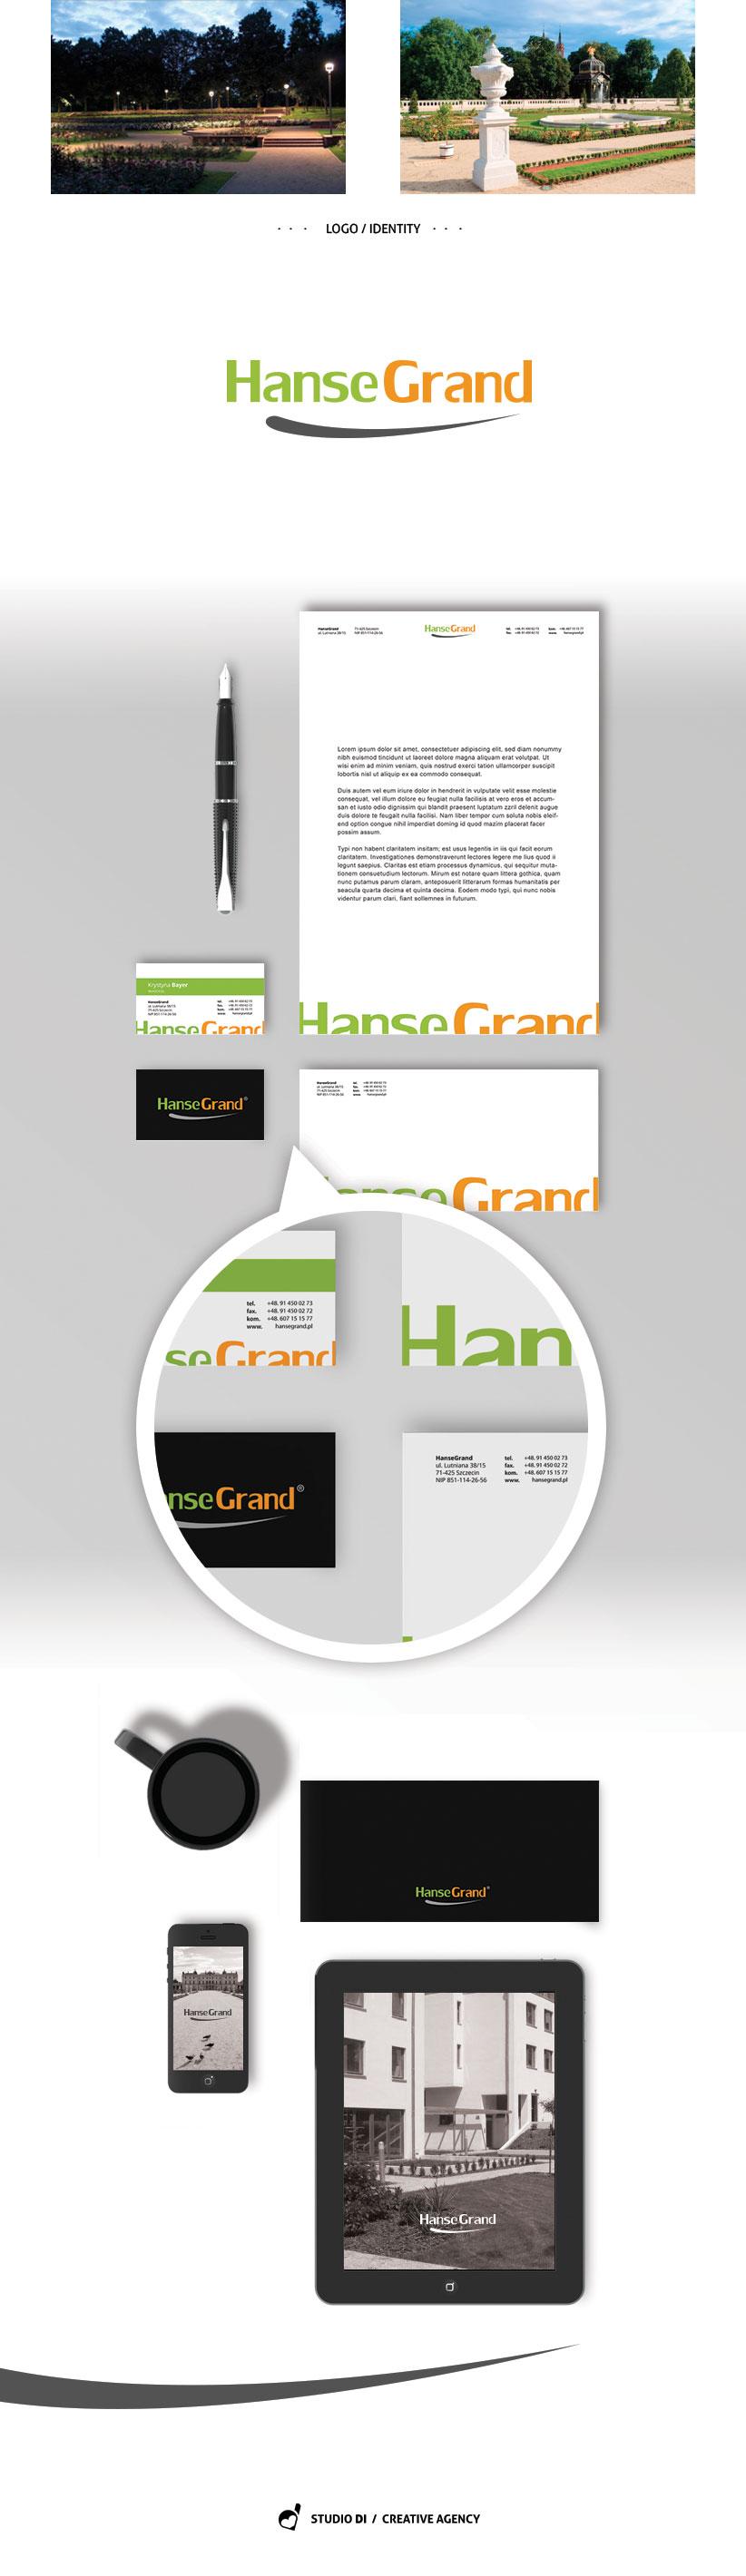 hansegrand-projekty